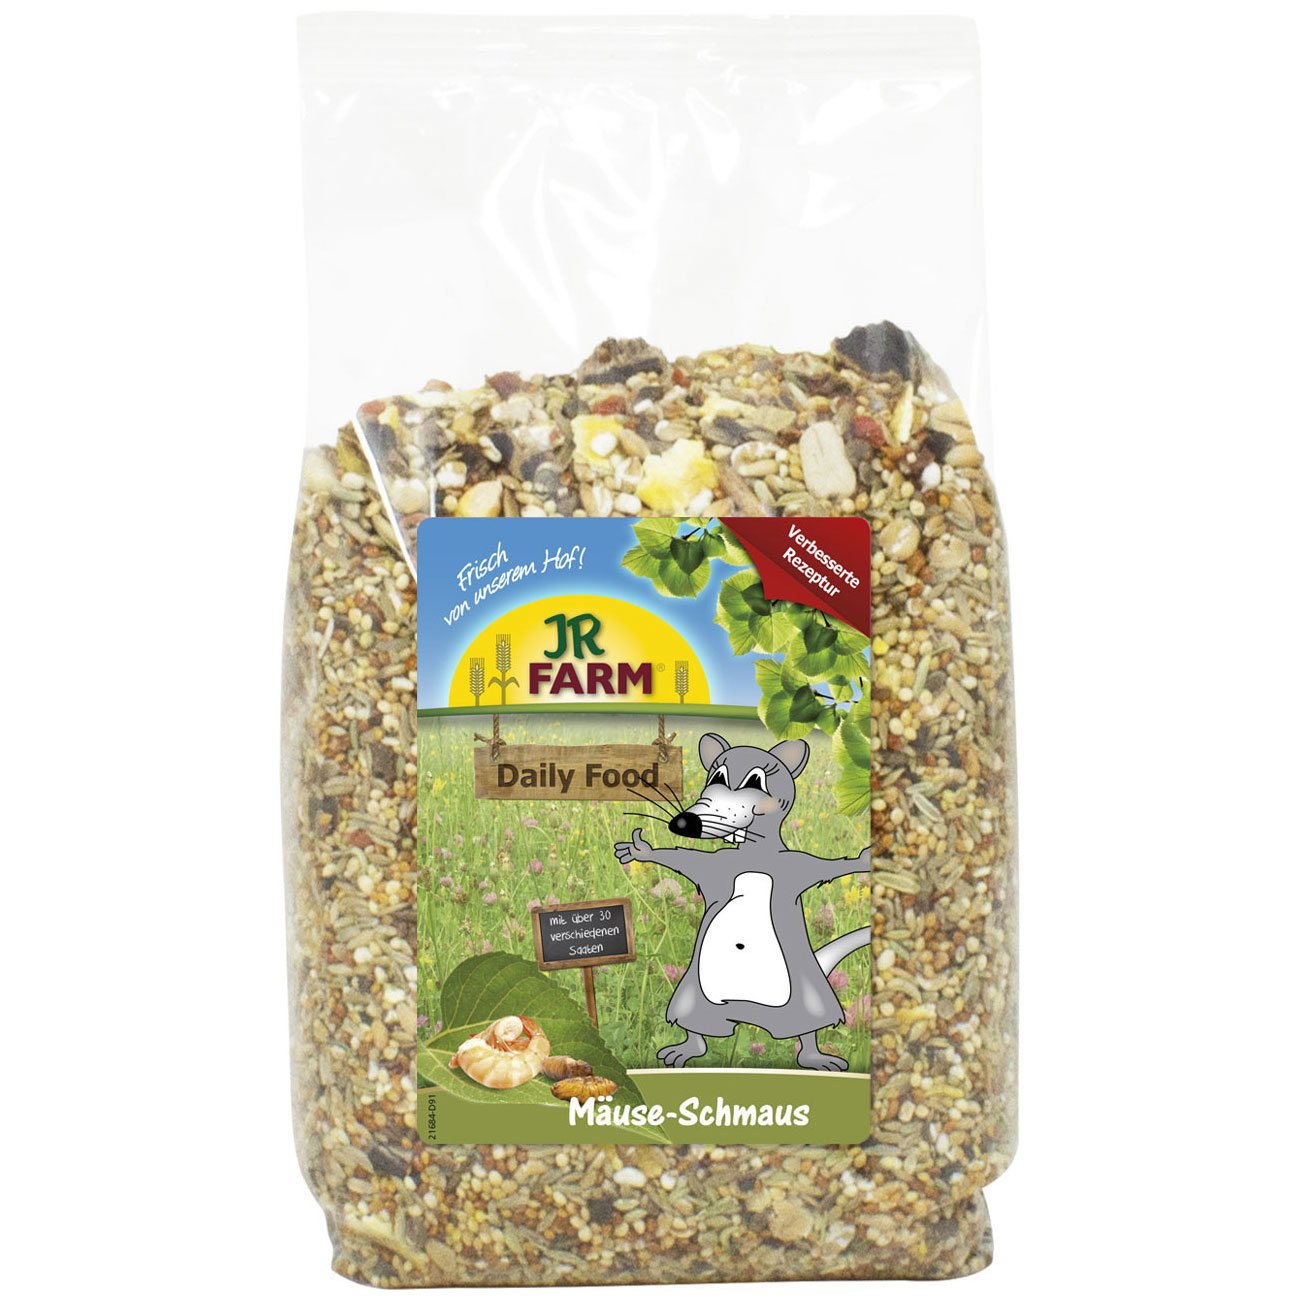 JR Farm Mäuse-Schmaus, 2,5kg